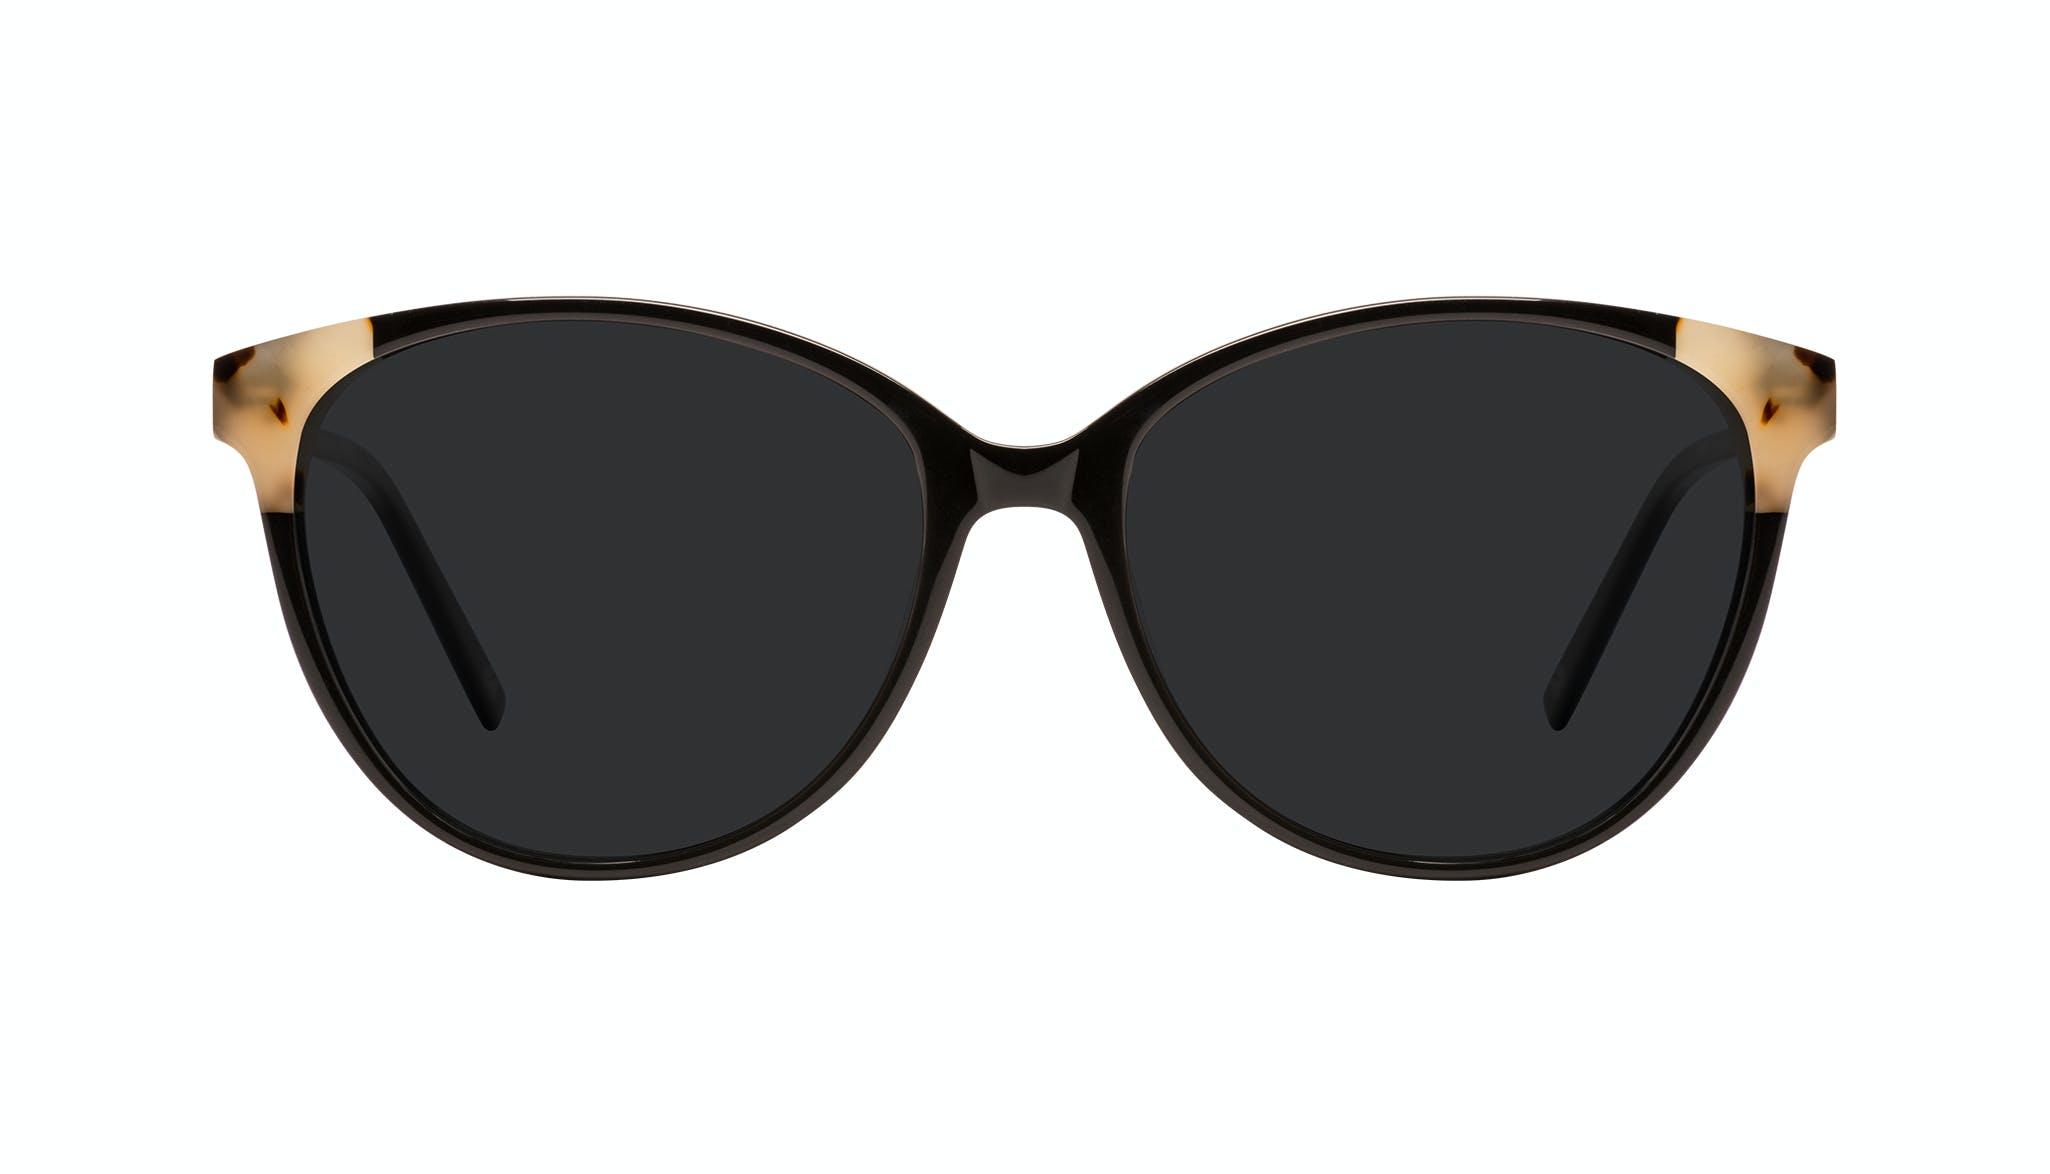 Affordable Fashion Glasses Cat Eye Sunglasses Women Imagine II Plus Ebony Granite